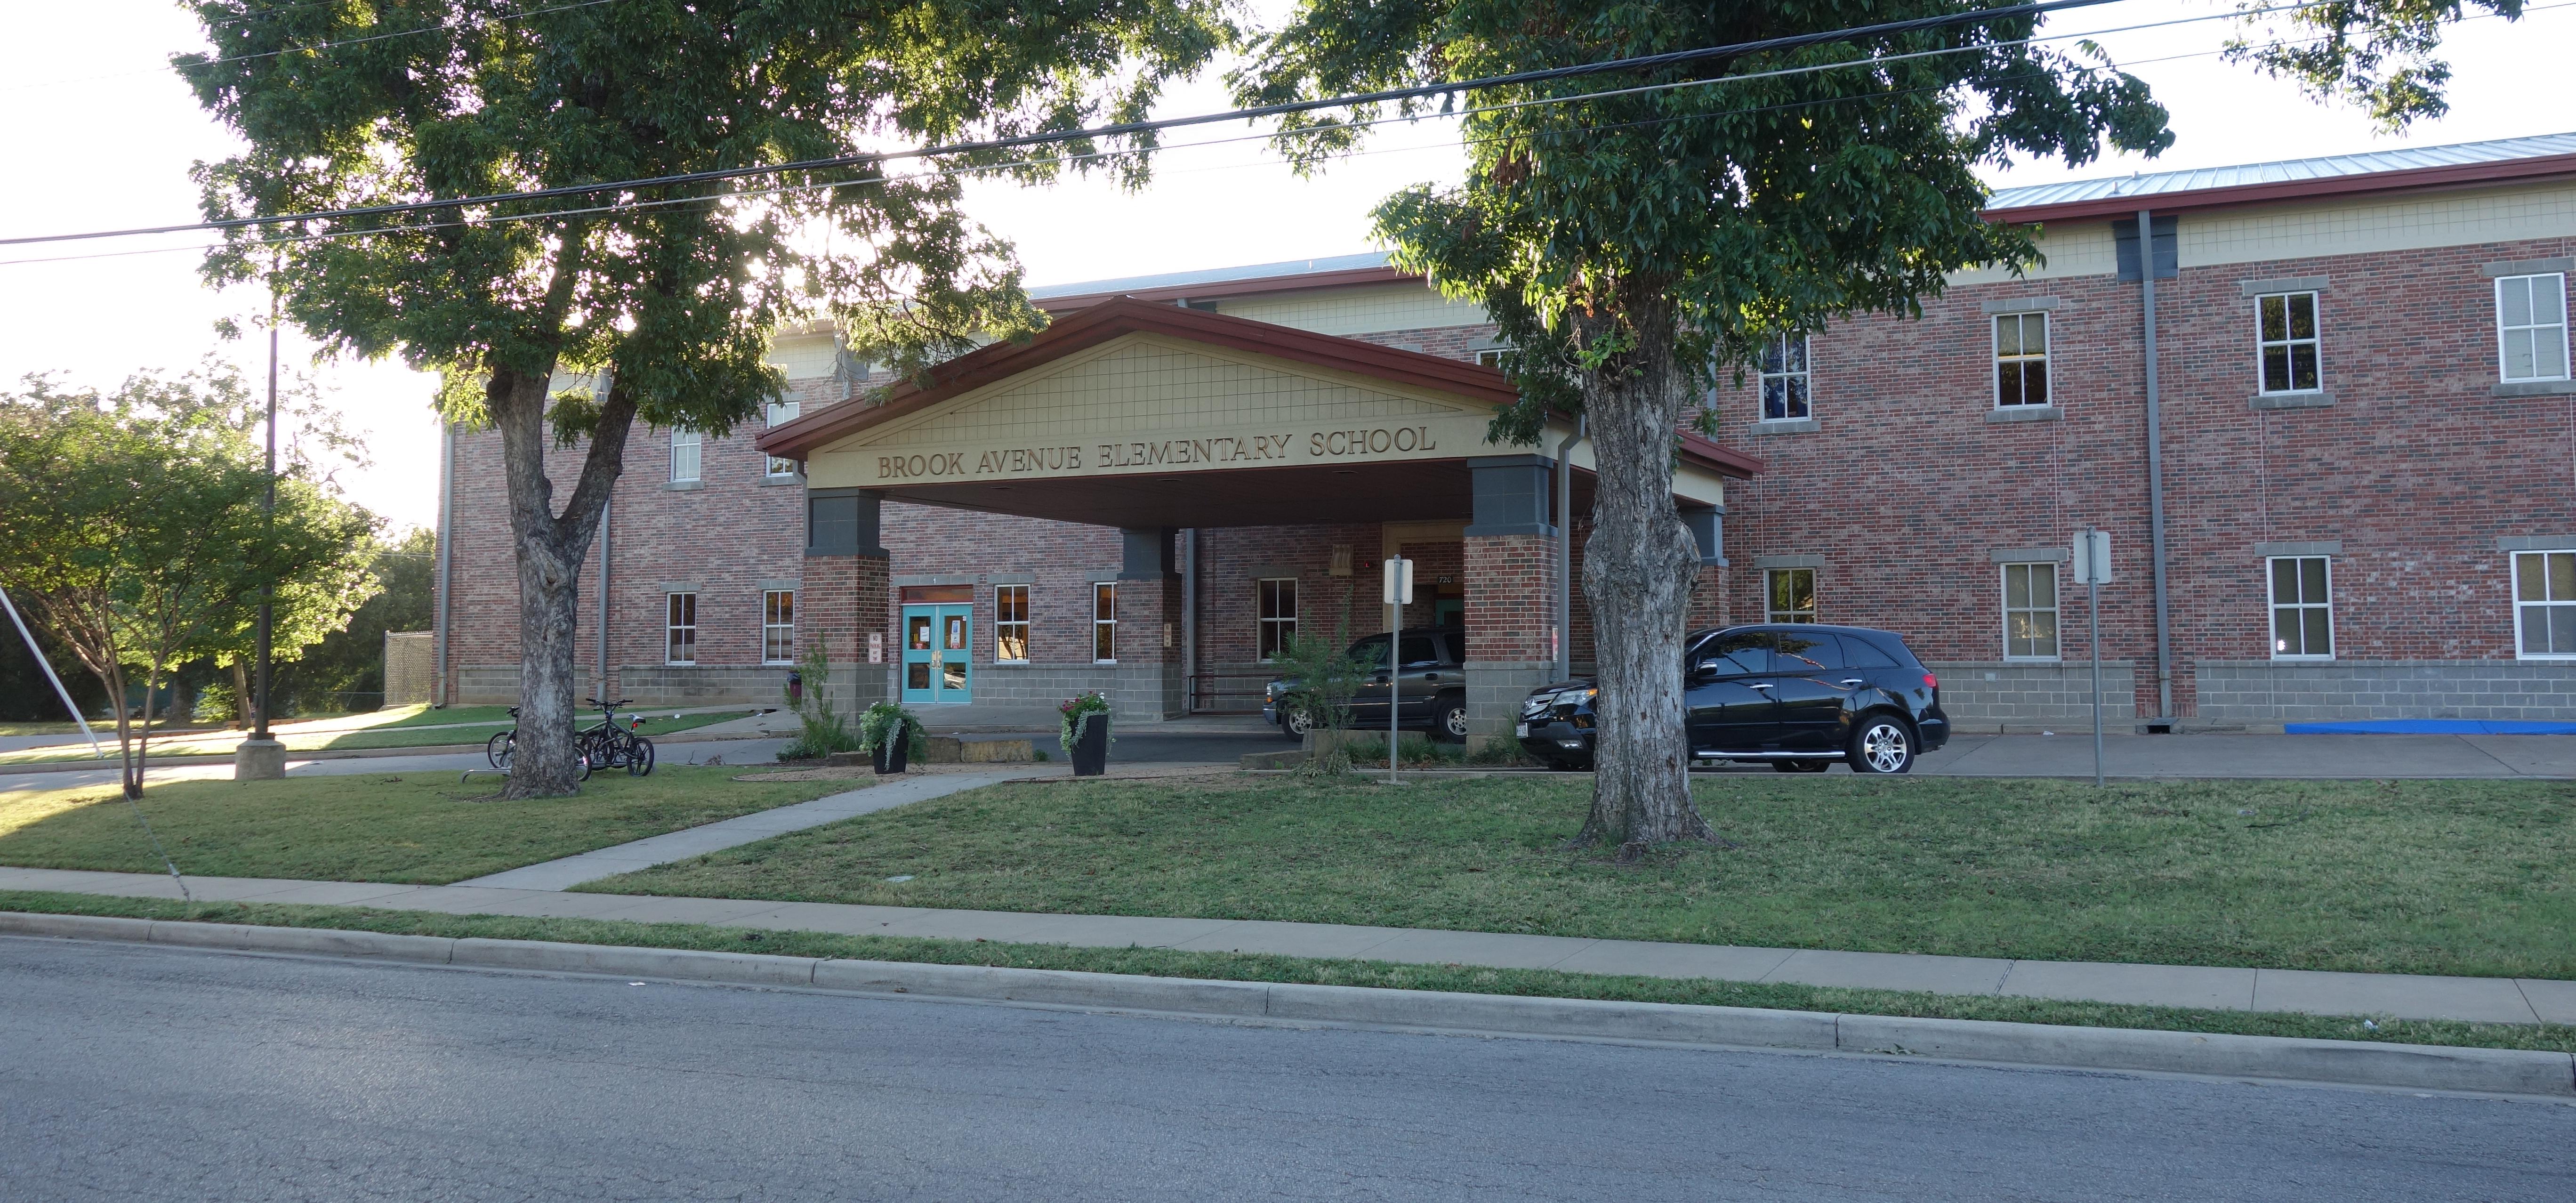 Brook Avenue Elementary